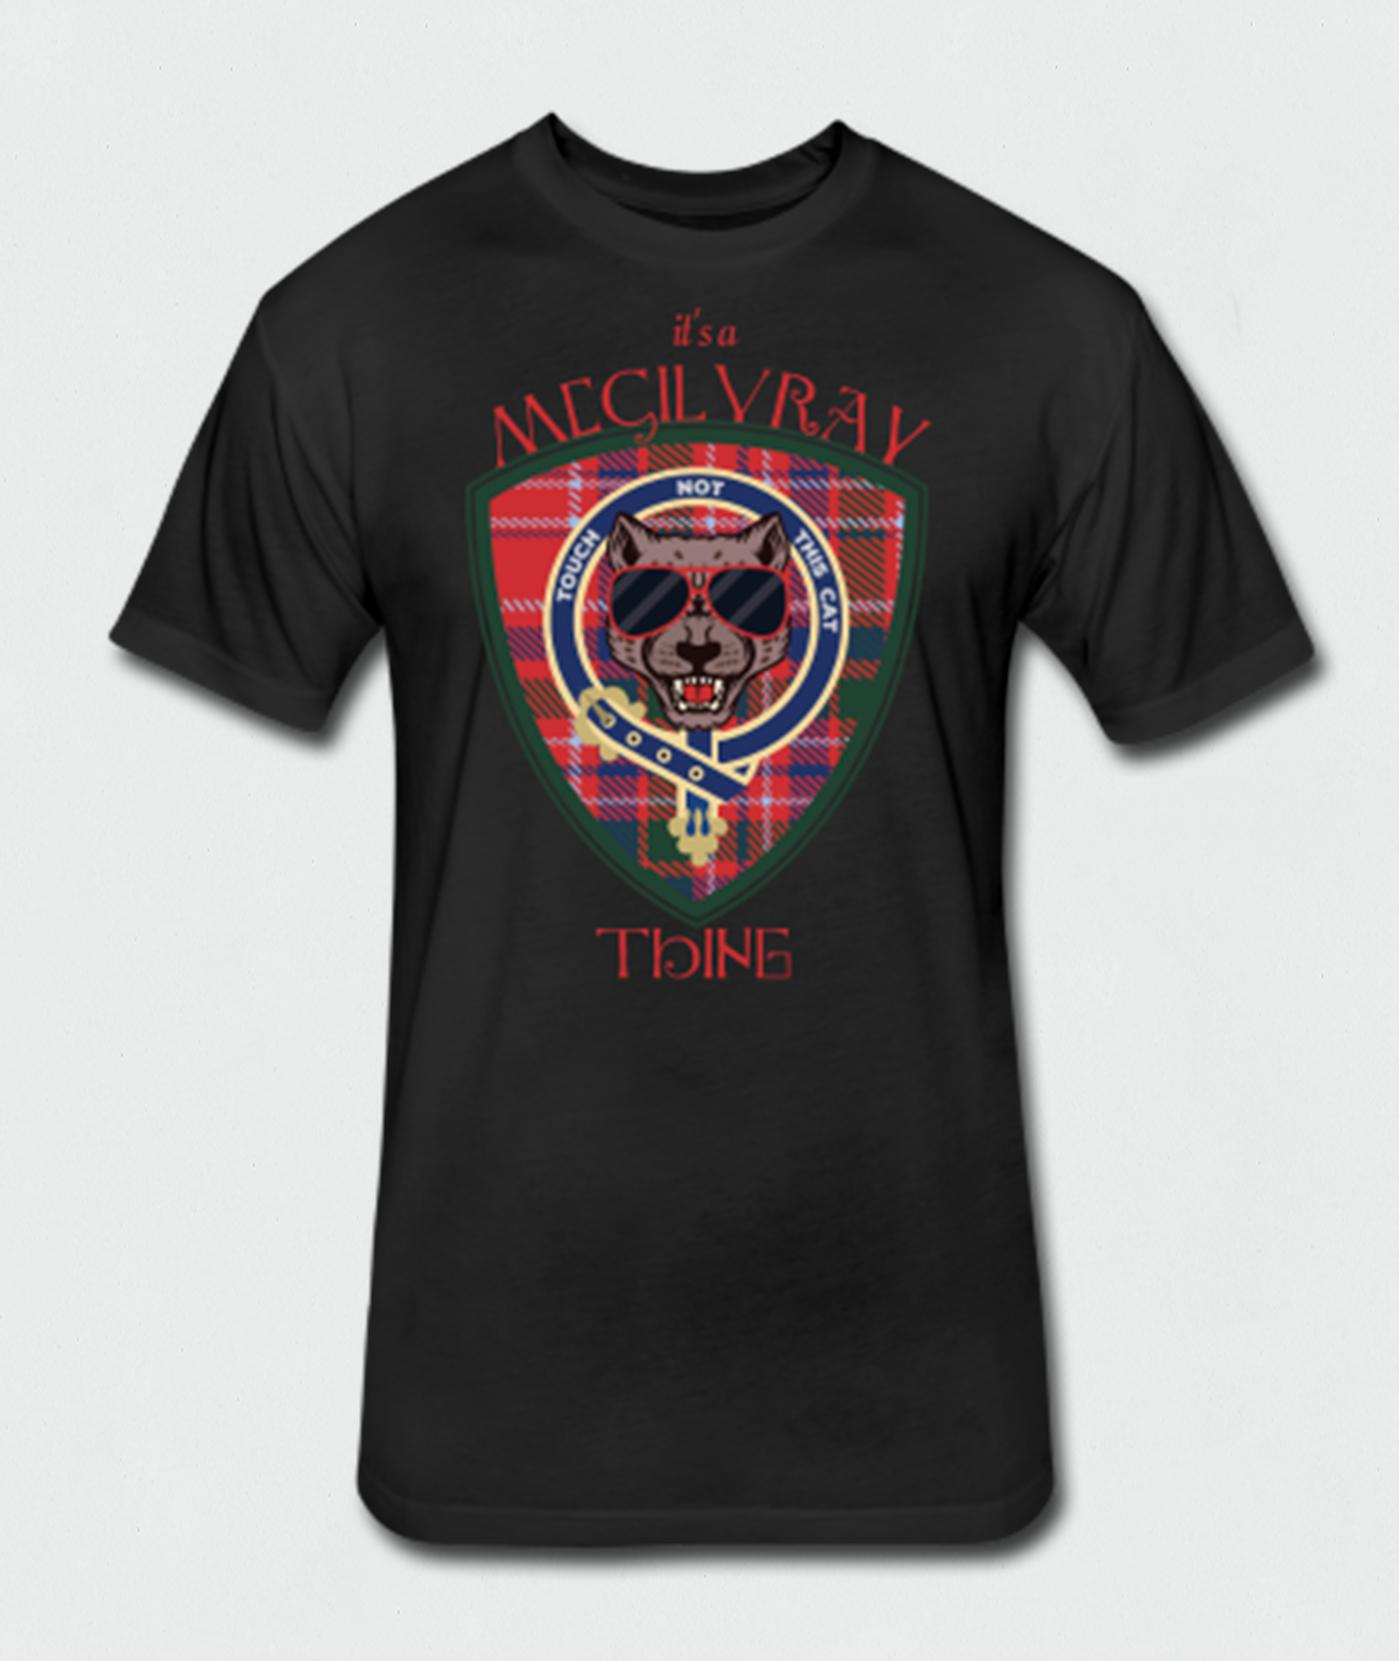 t-shirt-mcgilvray